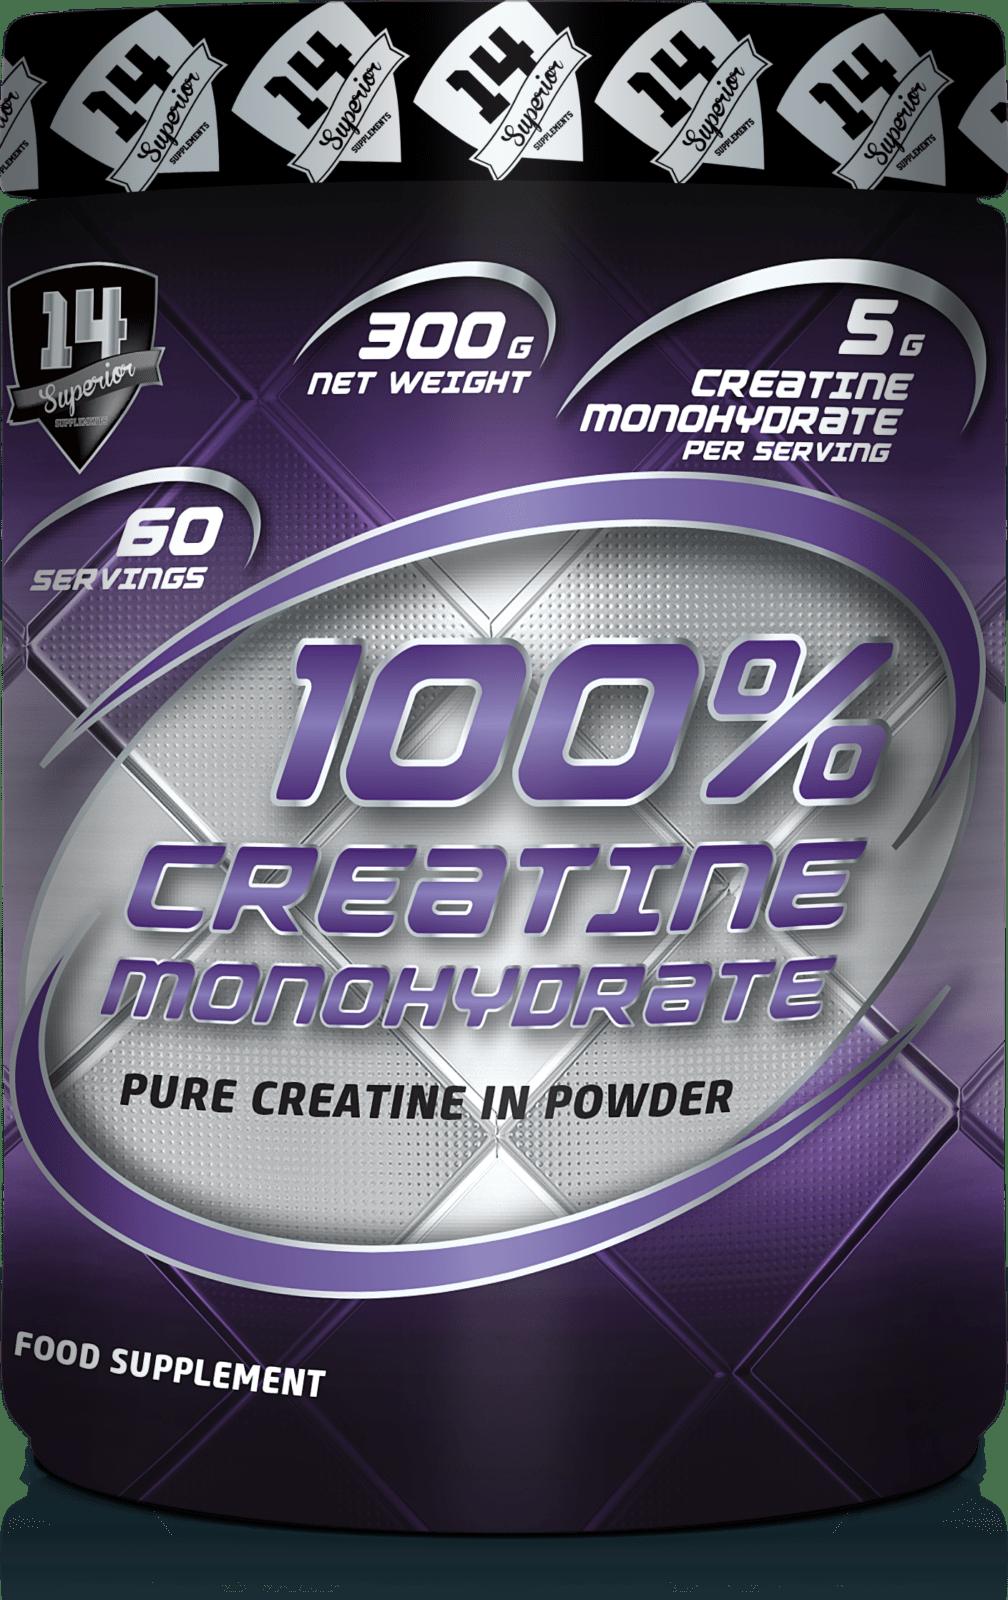 CREATINE MONOHYDRATE 100%….300g